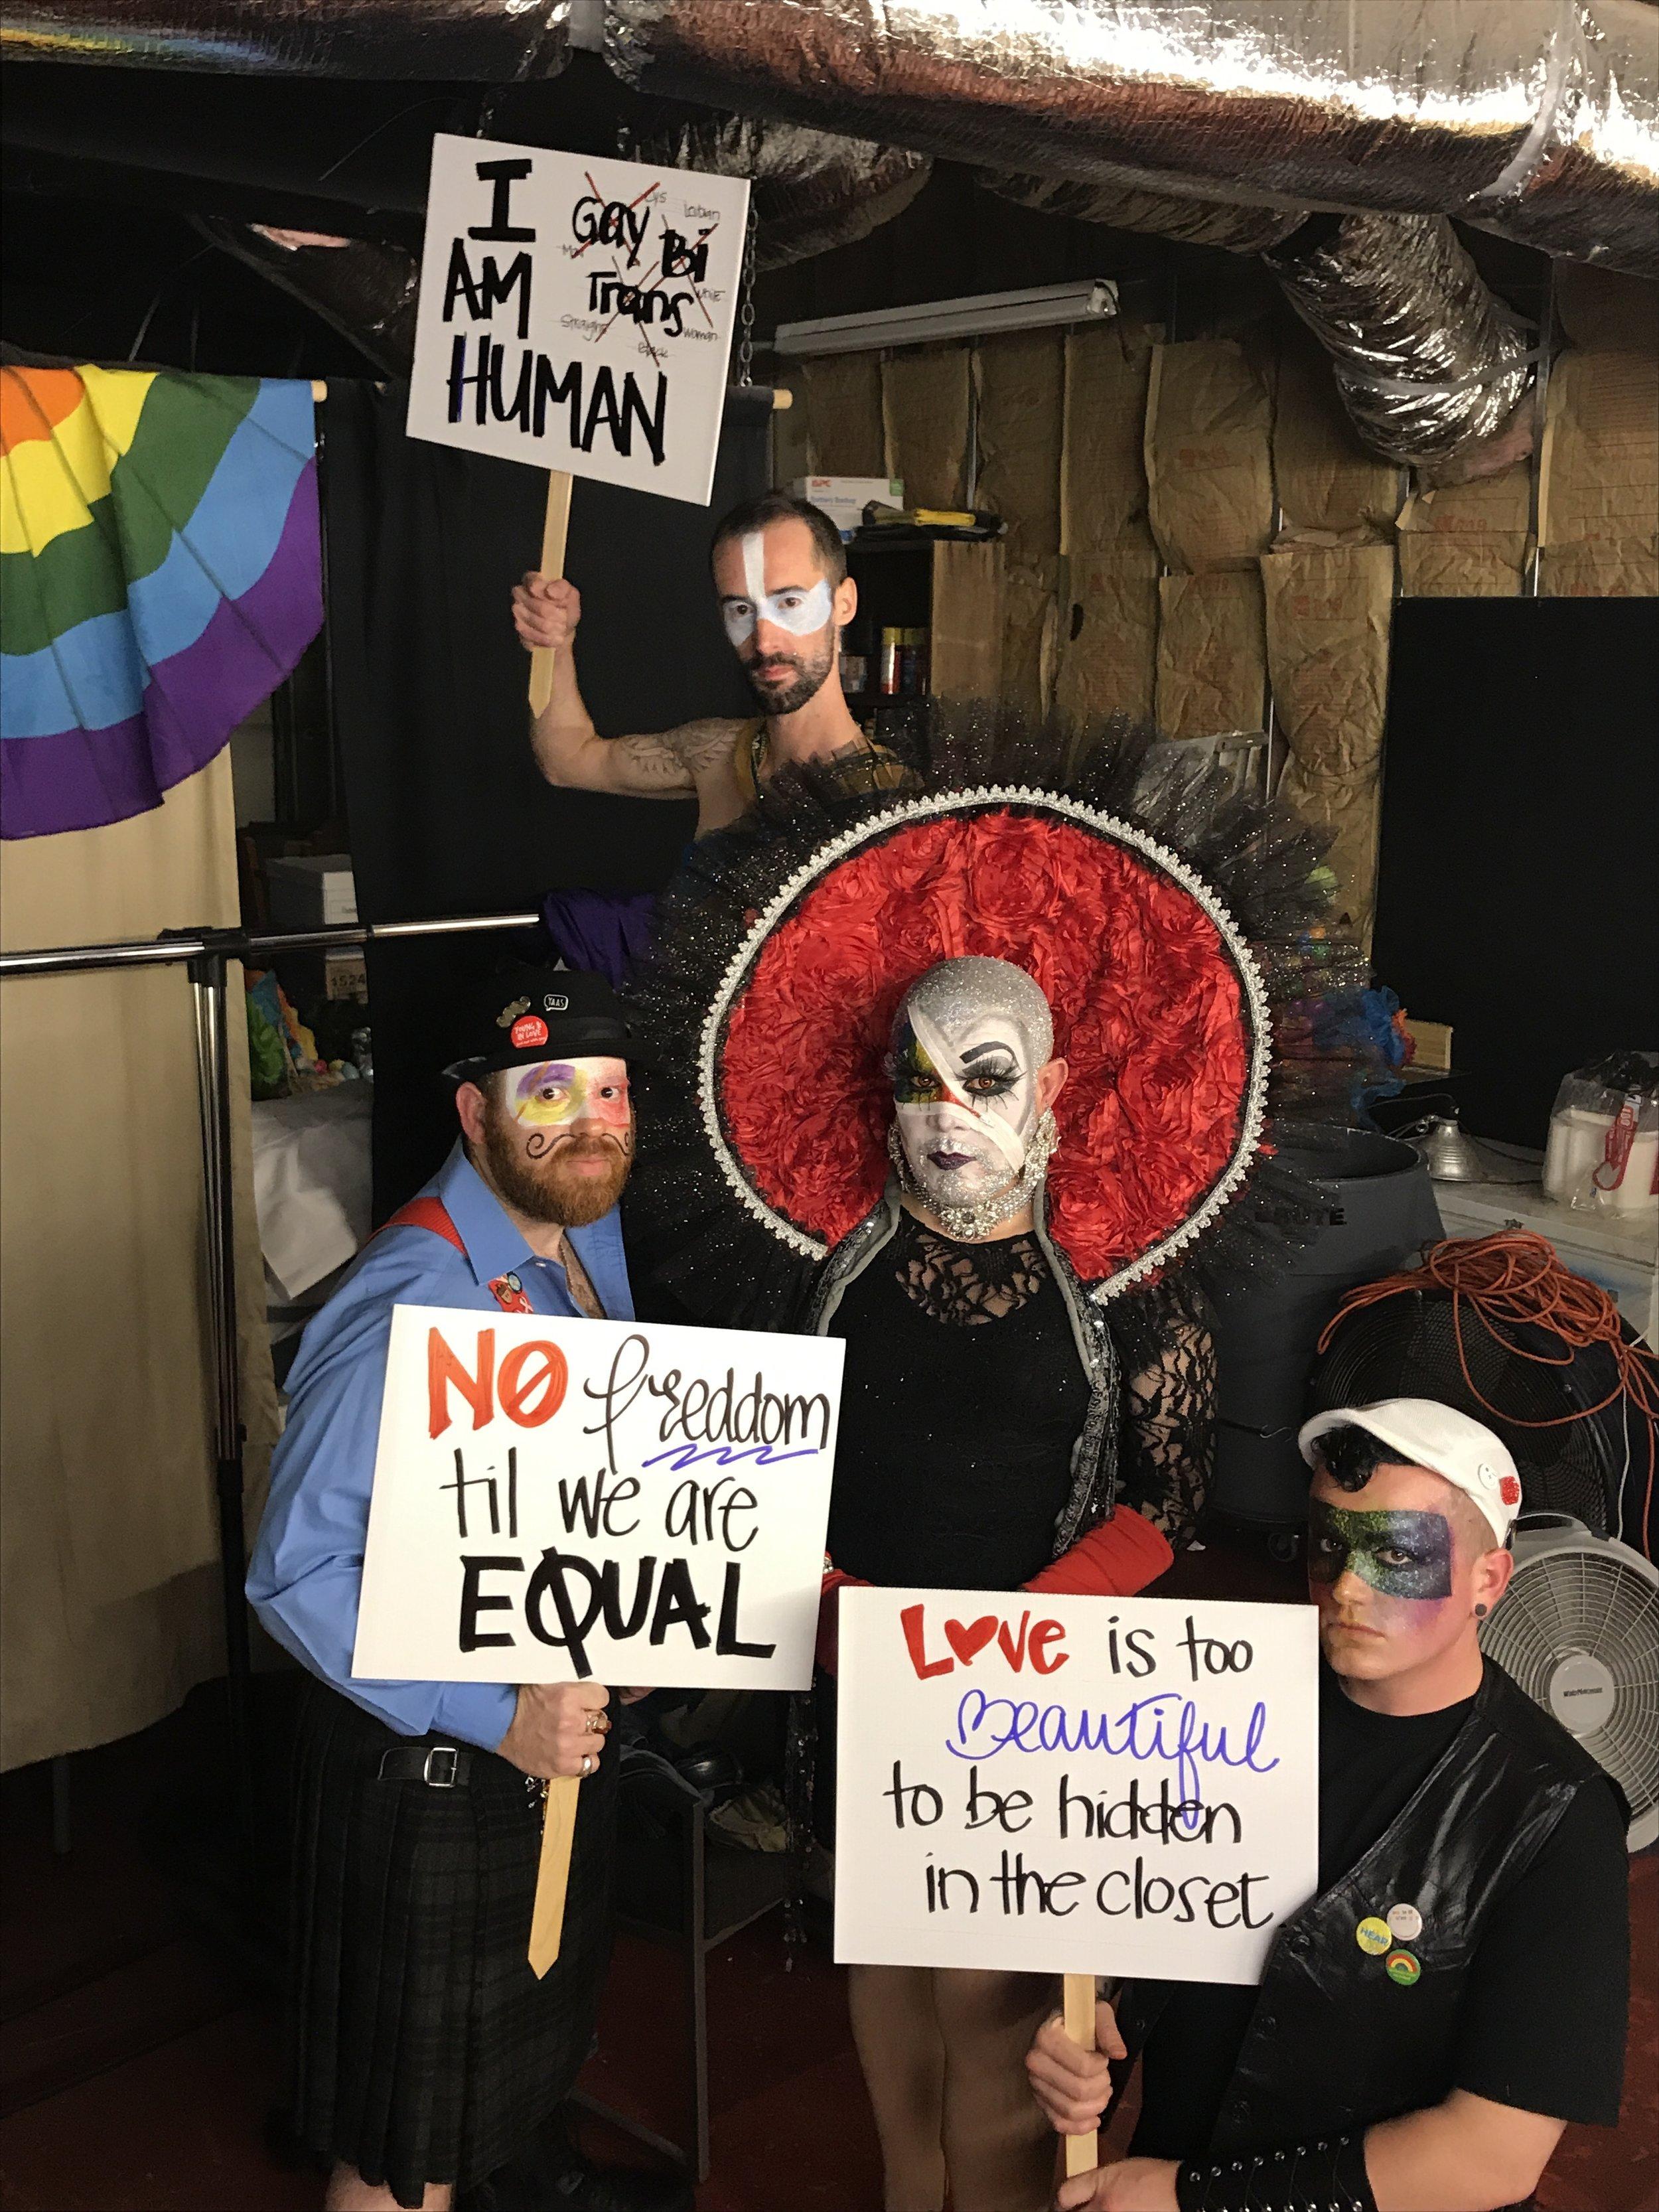 June 24, 2017 - Stonewall Commemoration Drag Show